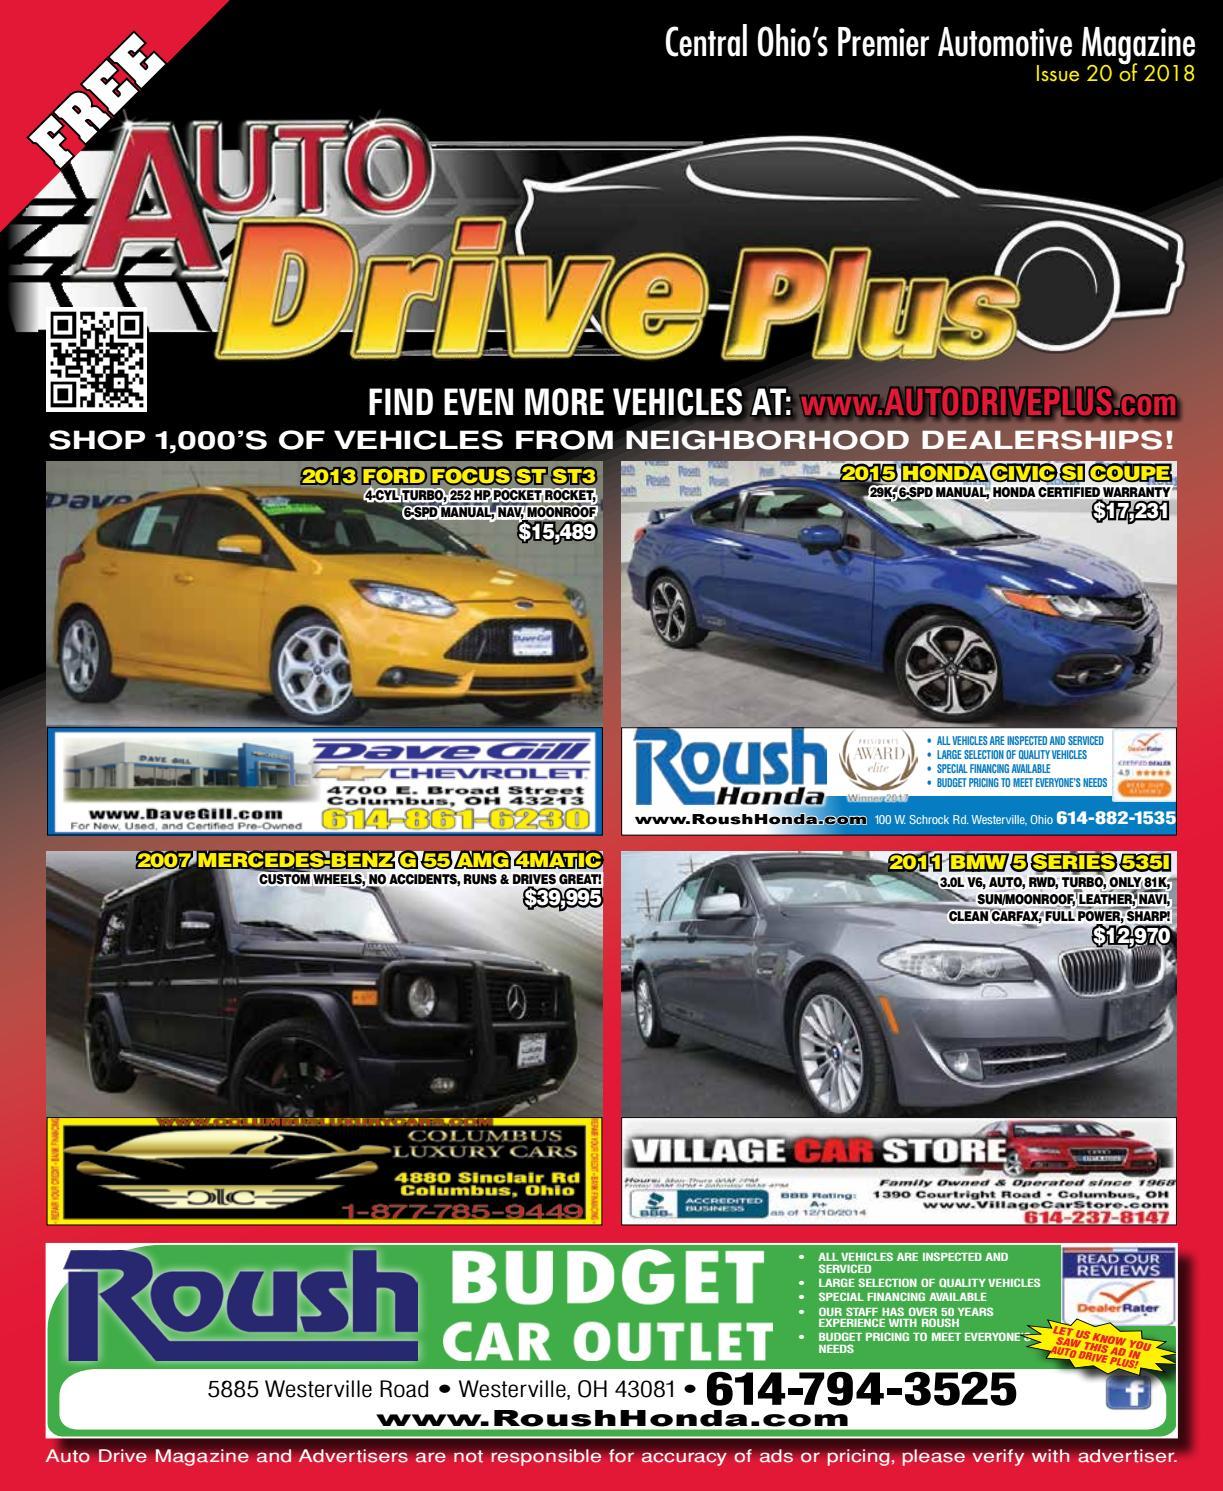 Autodrive Plus Magazine Issue 20 2018 By Autodriveplus Issuu